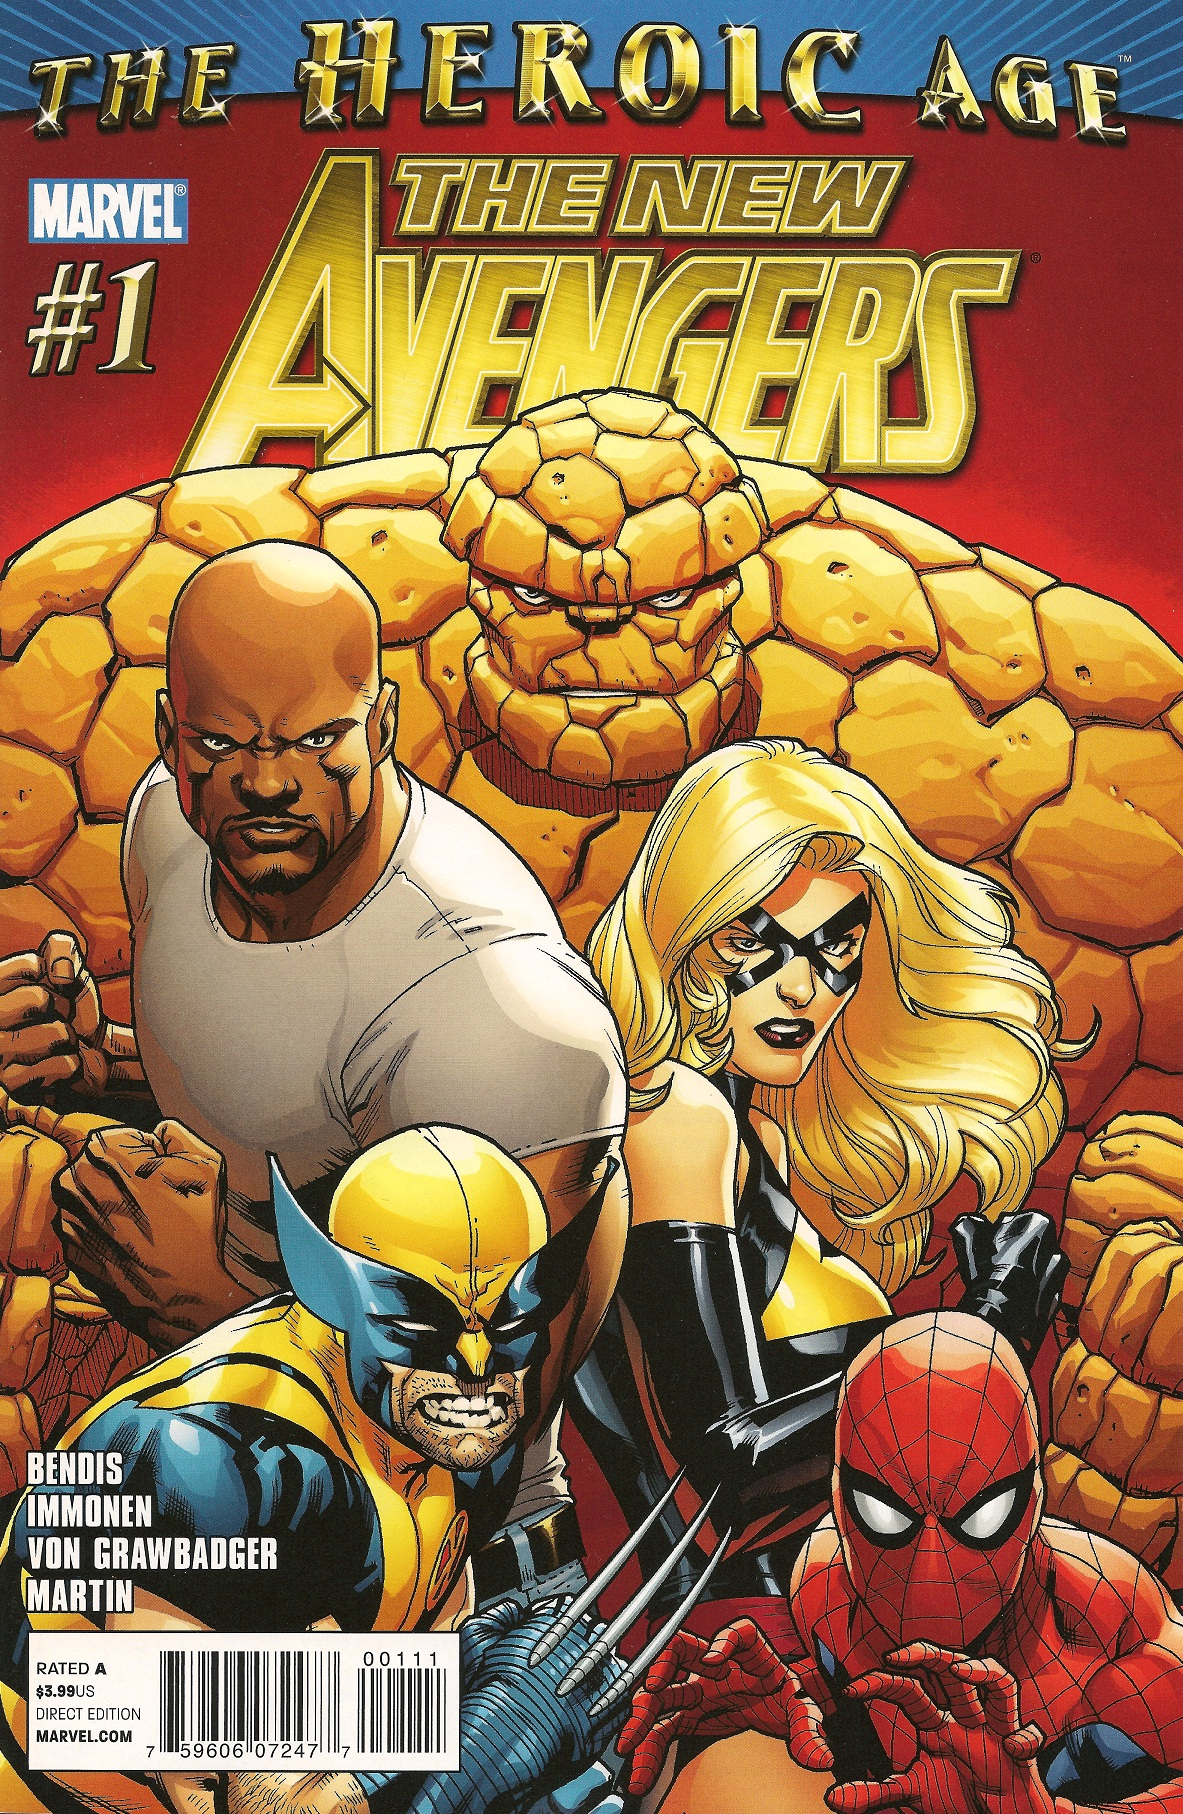 http://img3.wikia.nocookie.net/__cb20100618165826/marveldatabase/images/7/73/New_Avengers_Vol_2_1.jpg